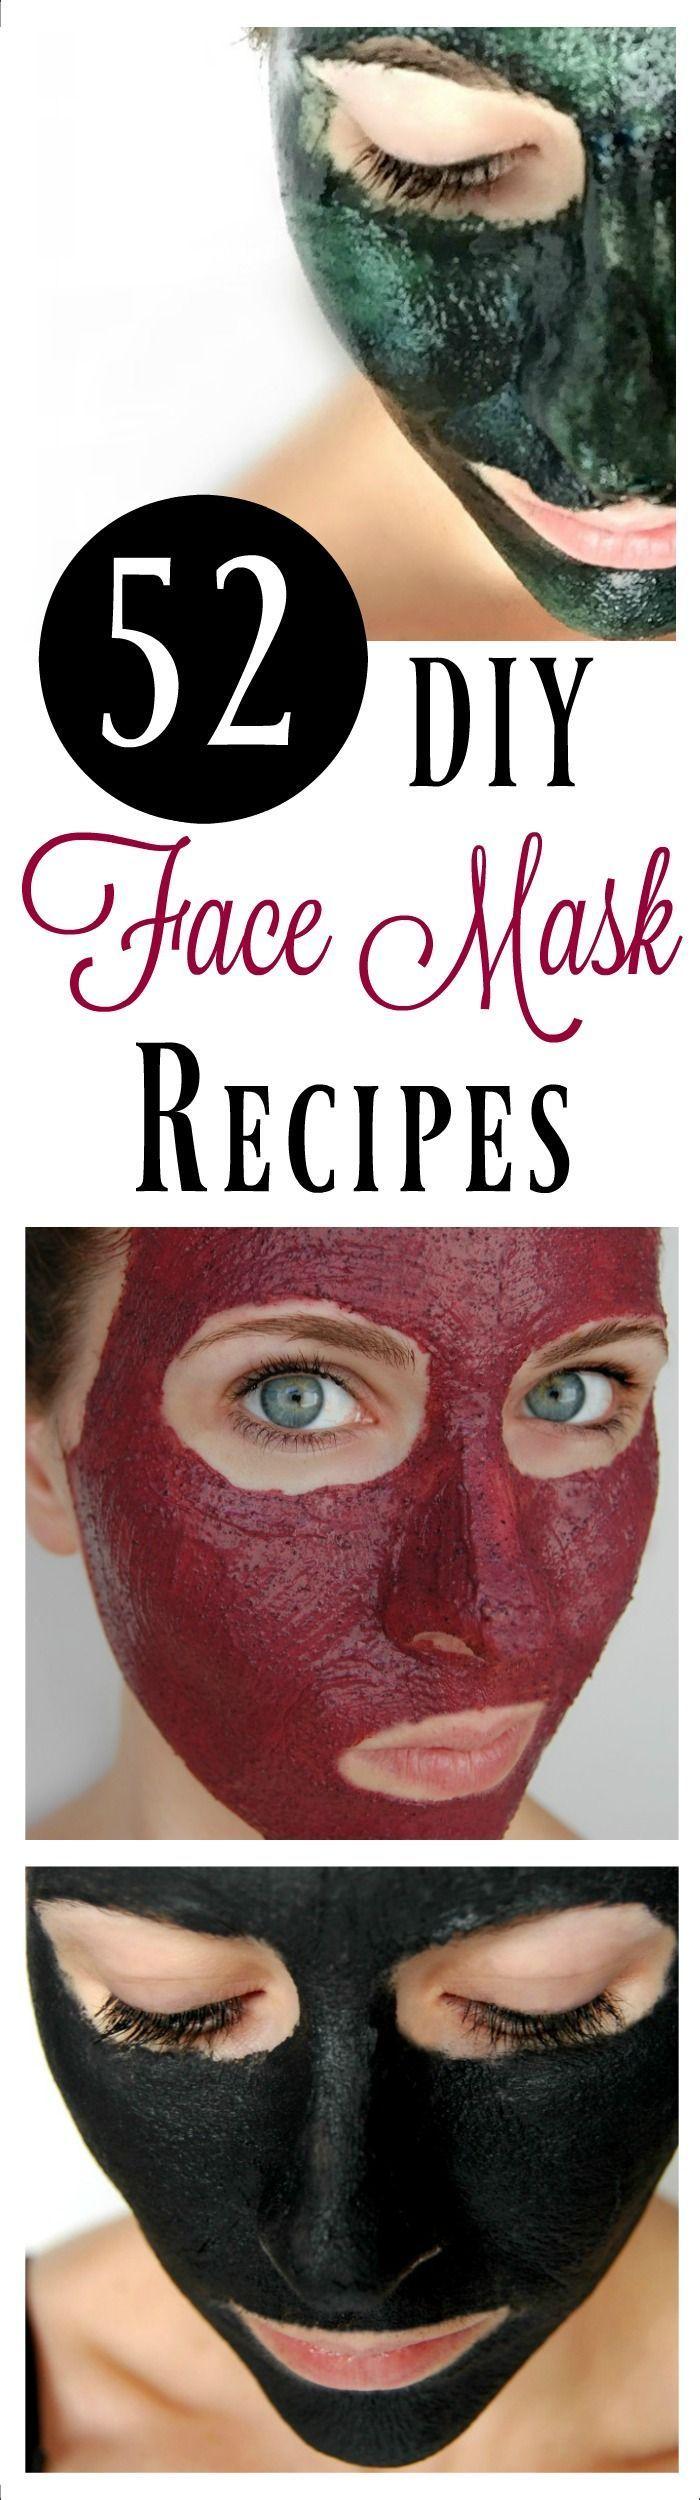 best 25+ face masks ideas on pinterest | diy acne mask, diy face